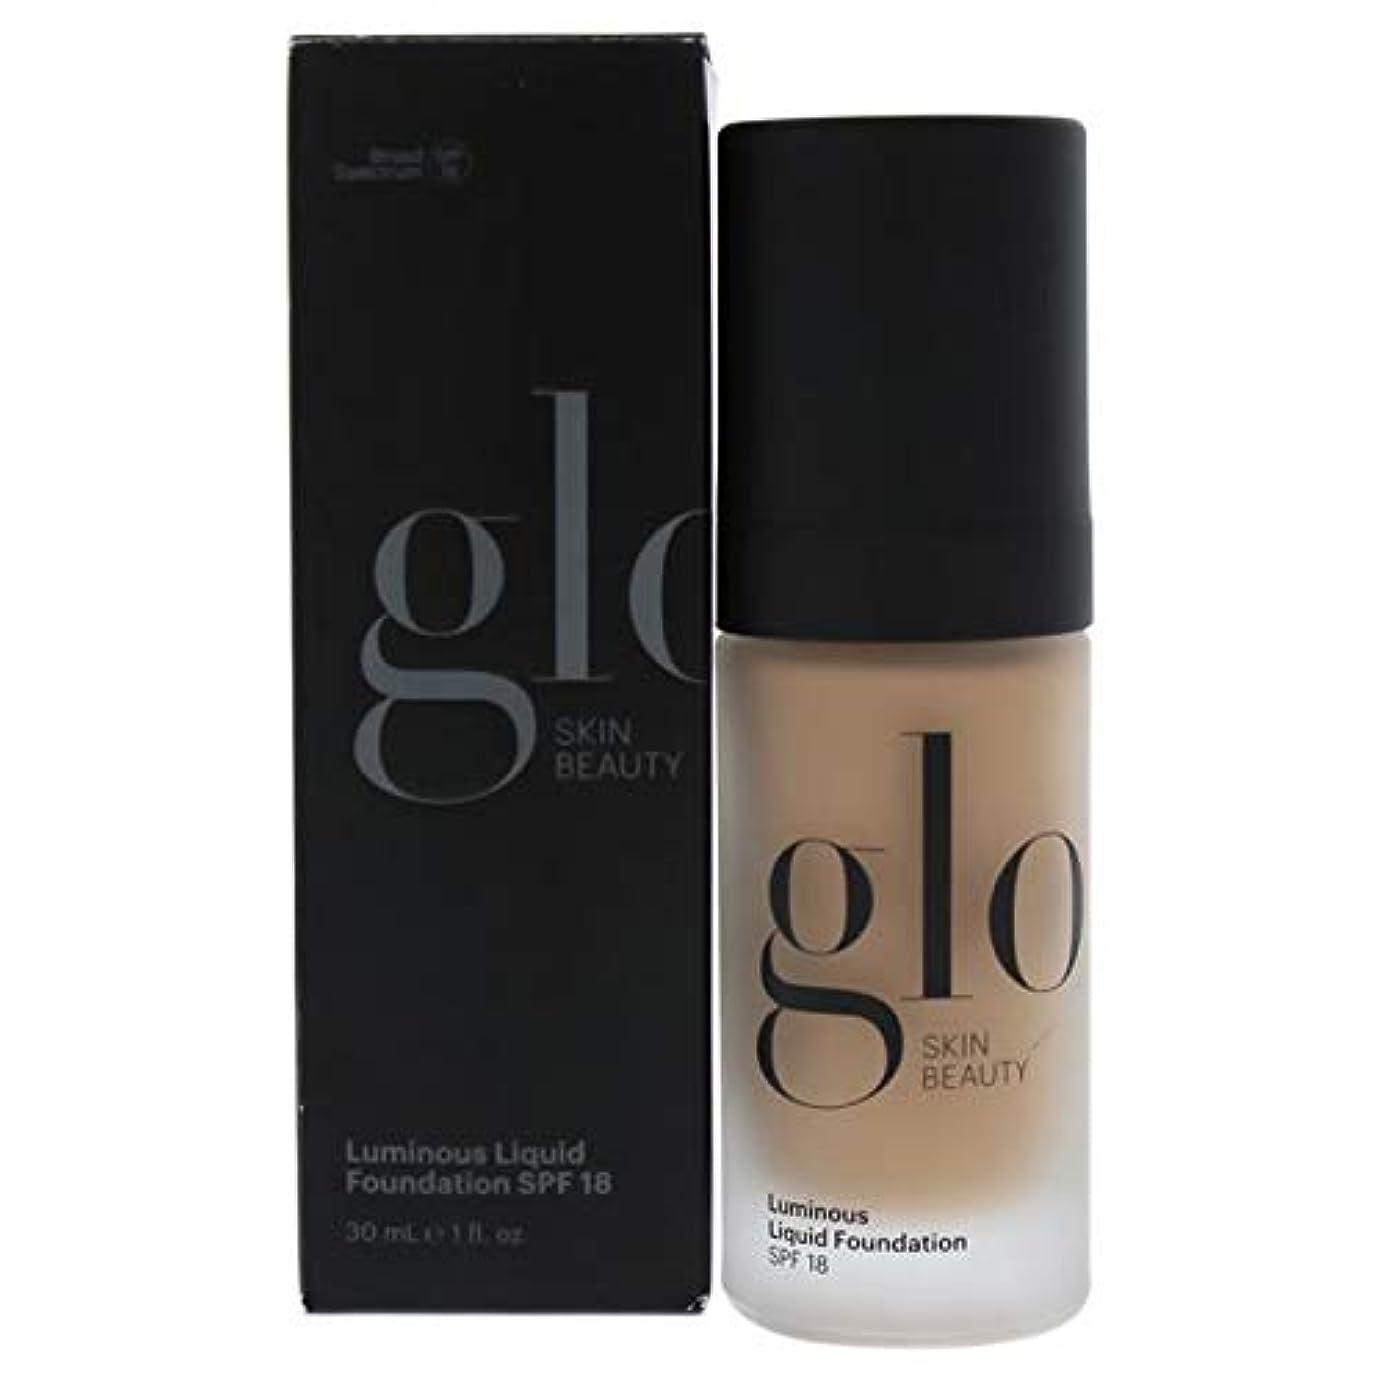 Glo Skin Beauty Luminous Liquid Foundation SPF18 - # Almond 30ml/1oz並行輸入品